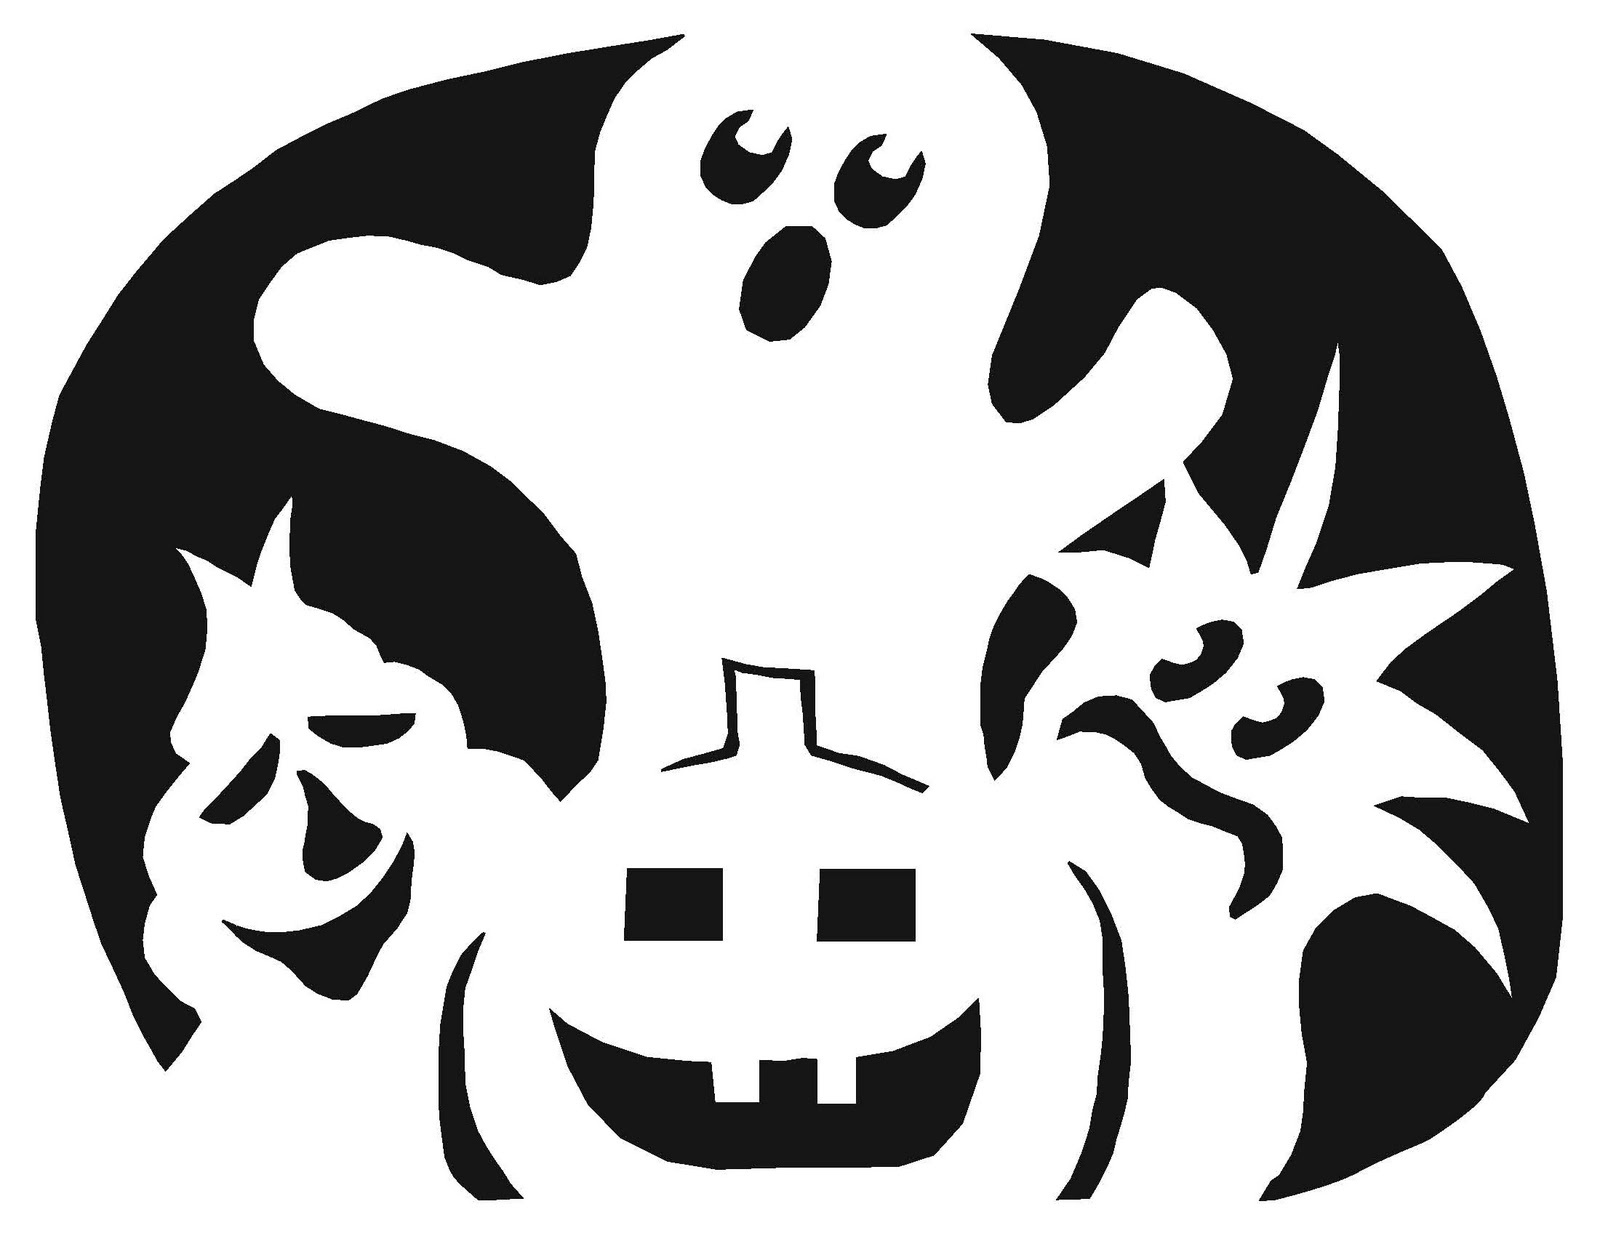 Free Guitar Pumpkin Stencil, Download Free Clip Art, Free Clip Art - Pumpkin Templates Free Printable